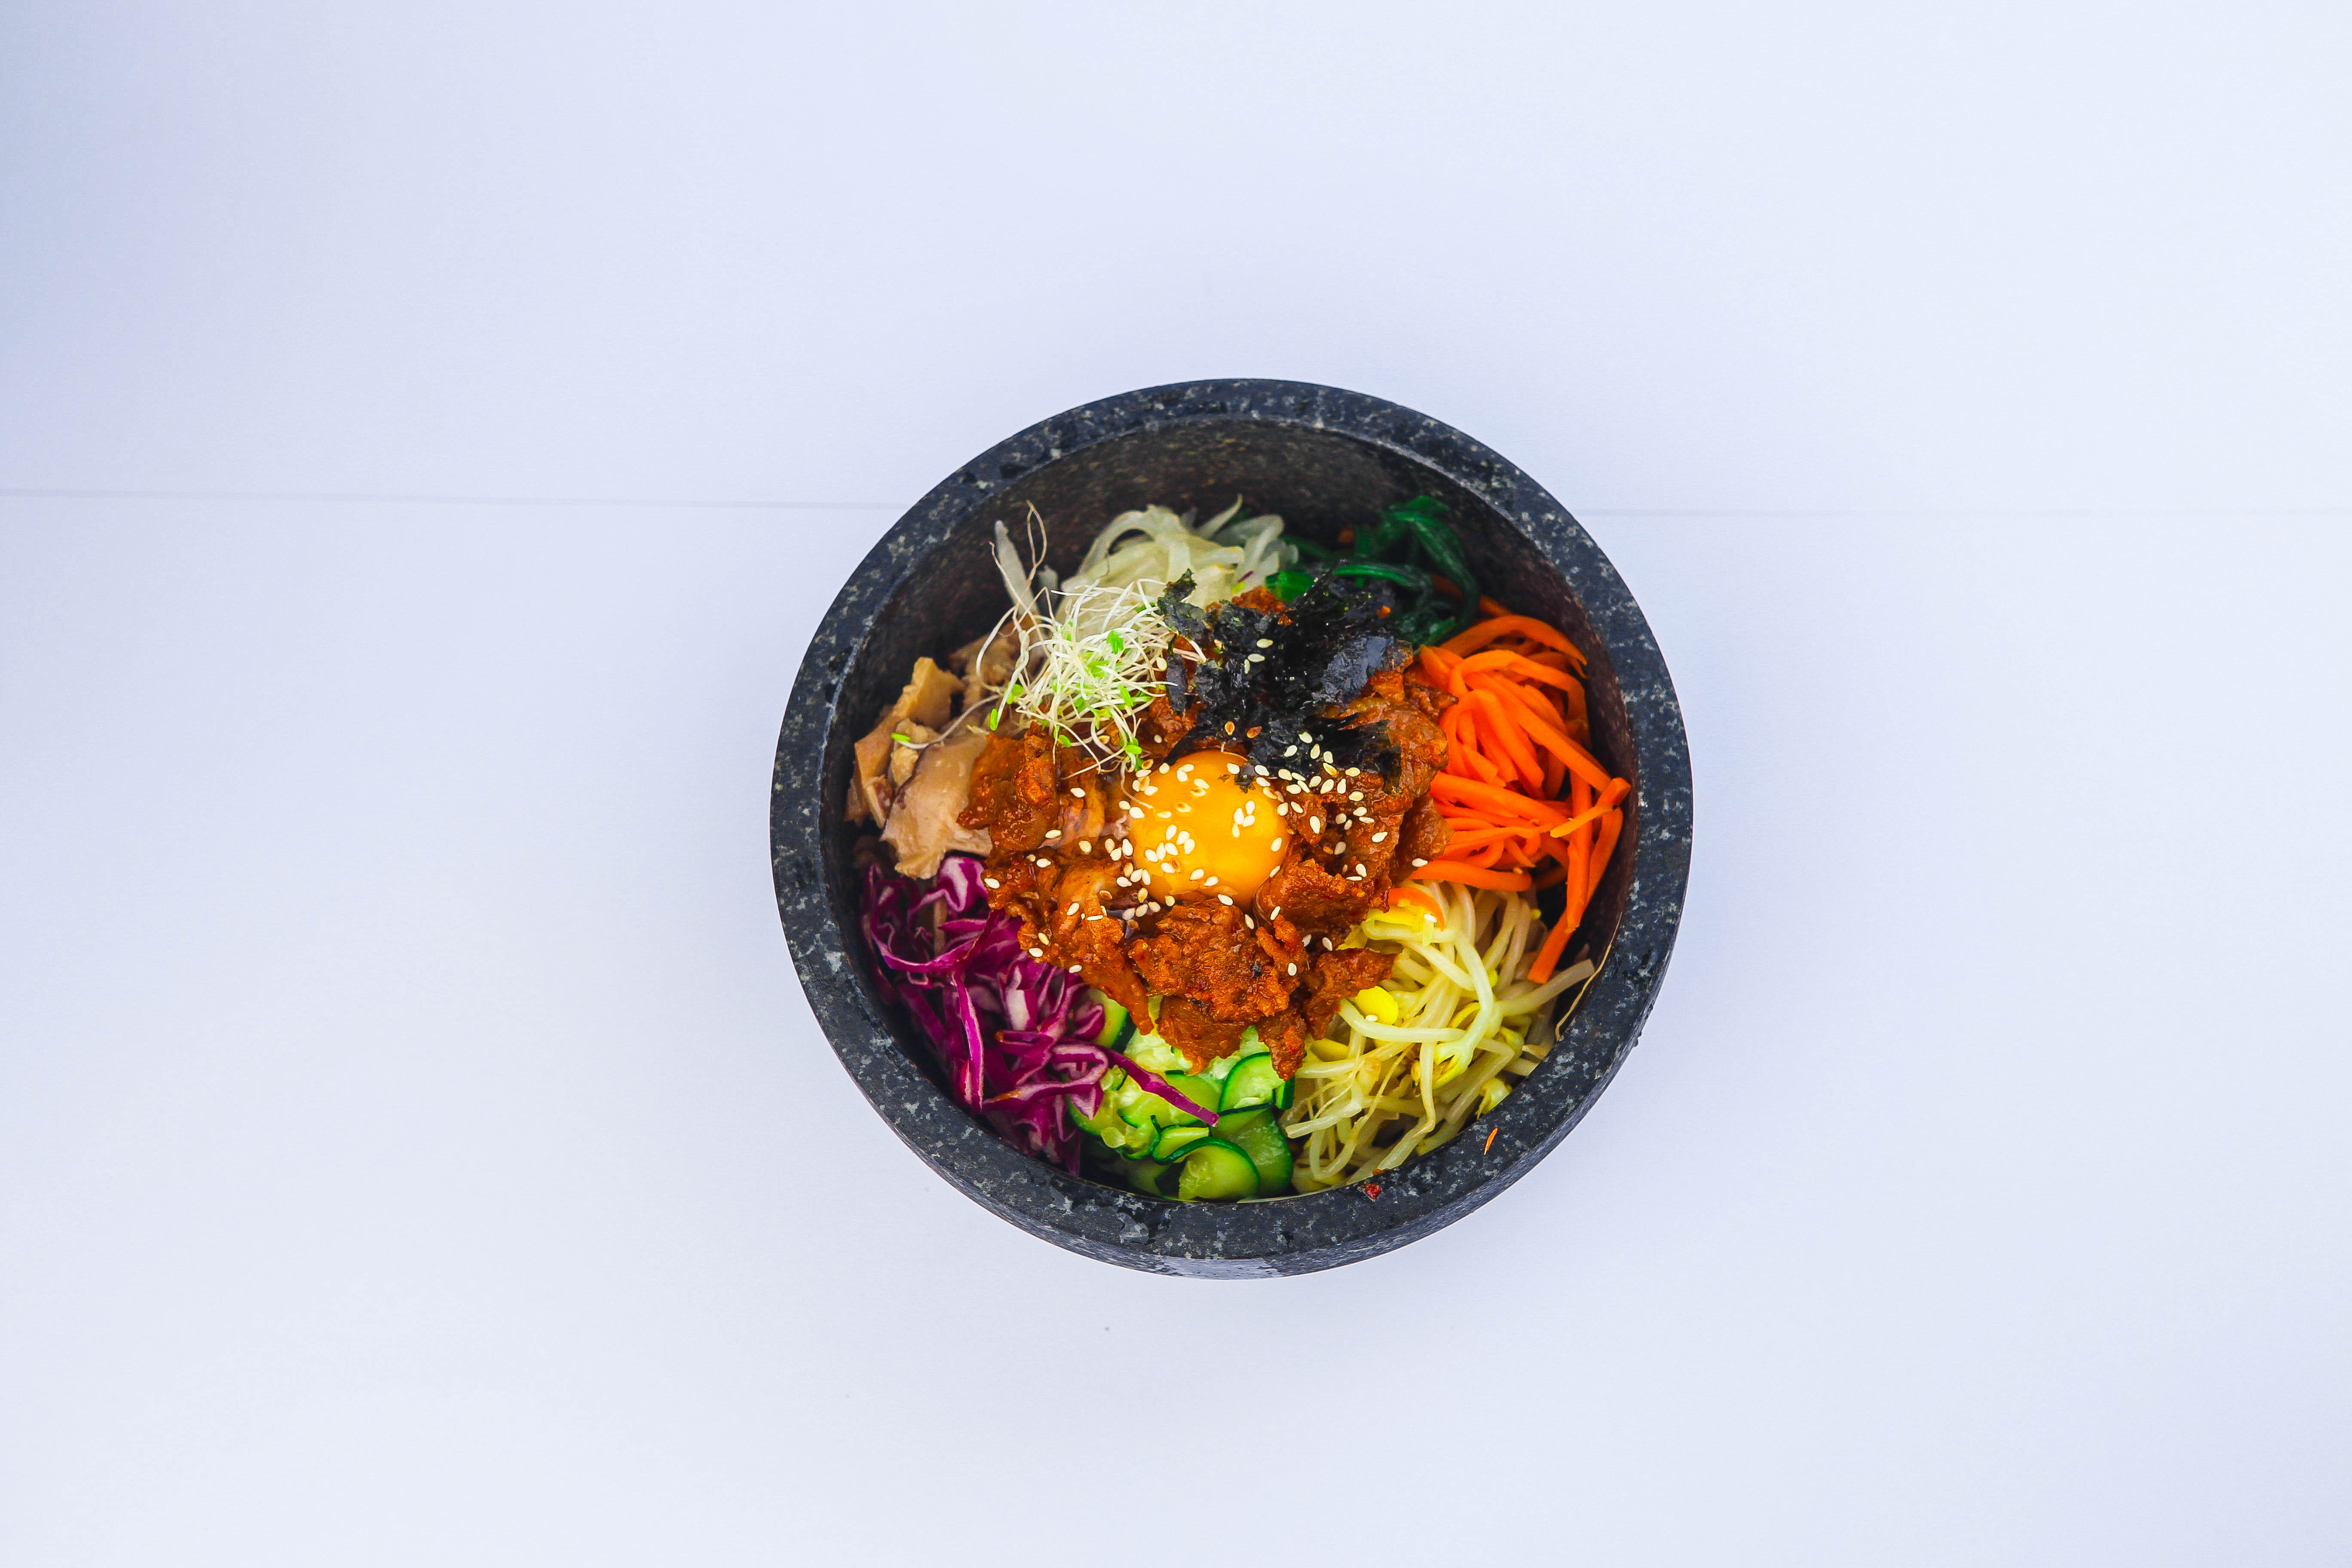 liquor-licensed-korean-restaurant-chinatown-300k-profit-to-owner-5